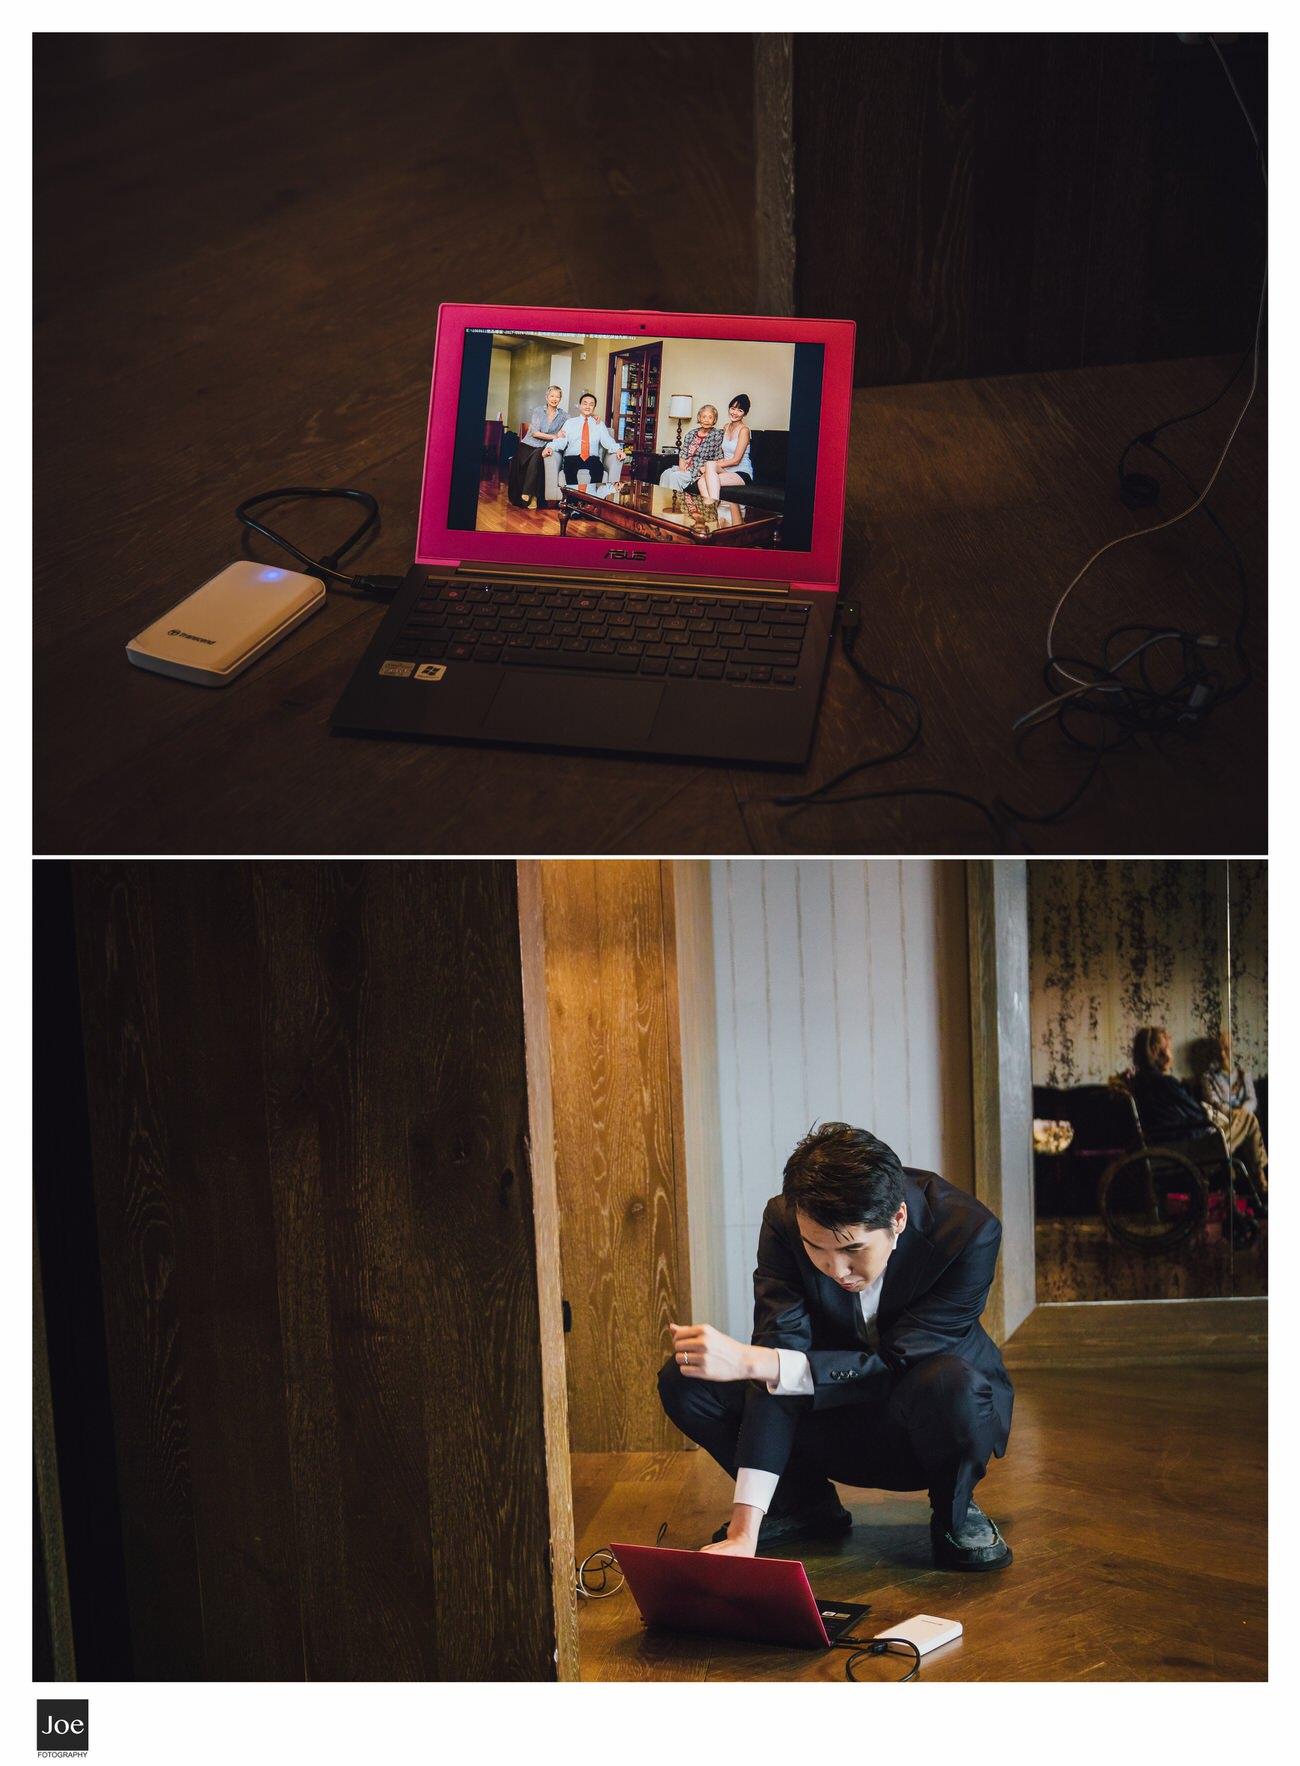 joe-fotography-wedding-photo-palais-de-chine-hotel-002.jpg